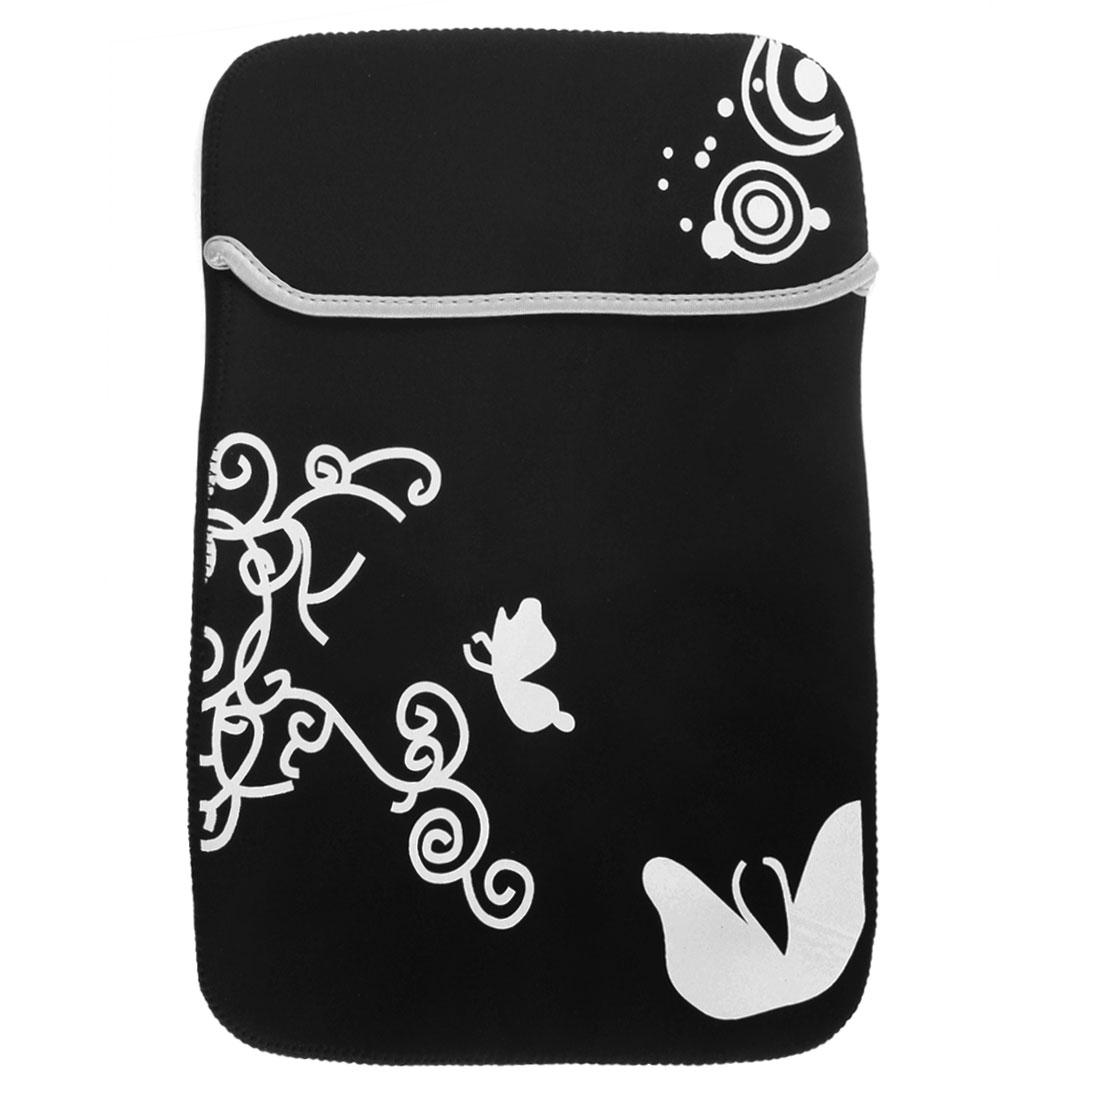 "13"" Flower Butterfly Pattern Soft PC Laptop Tablet Netbook Sleeve Case Bag Black"